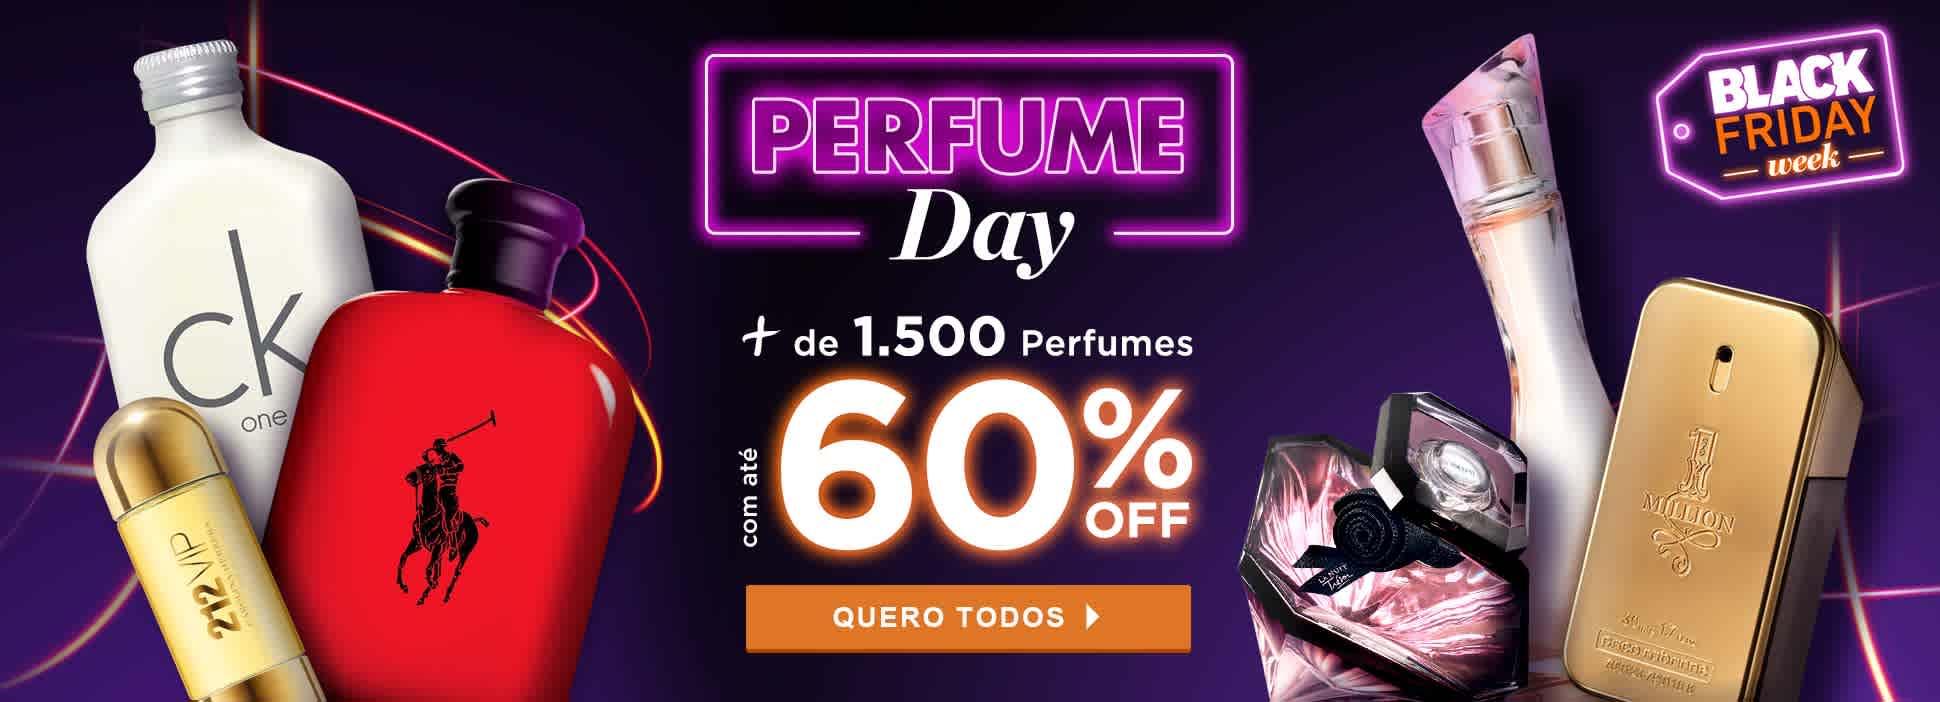 Home: Blackfriday Perfumes ate 60% off